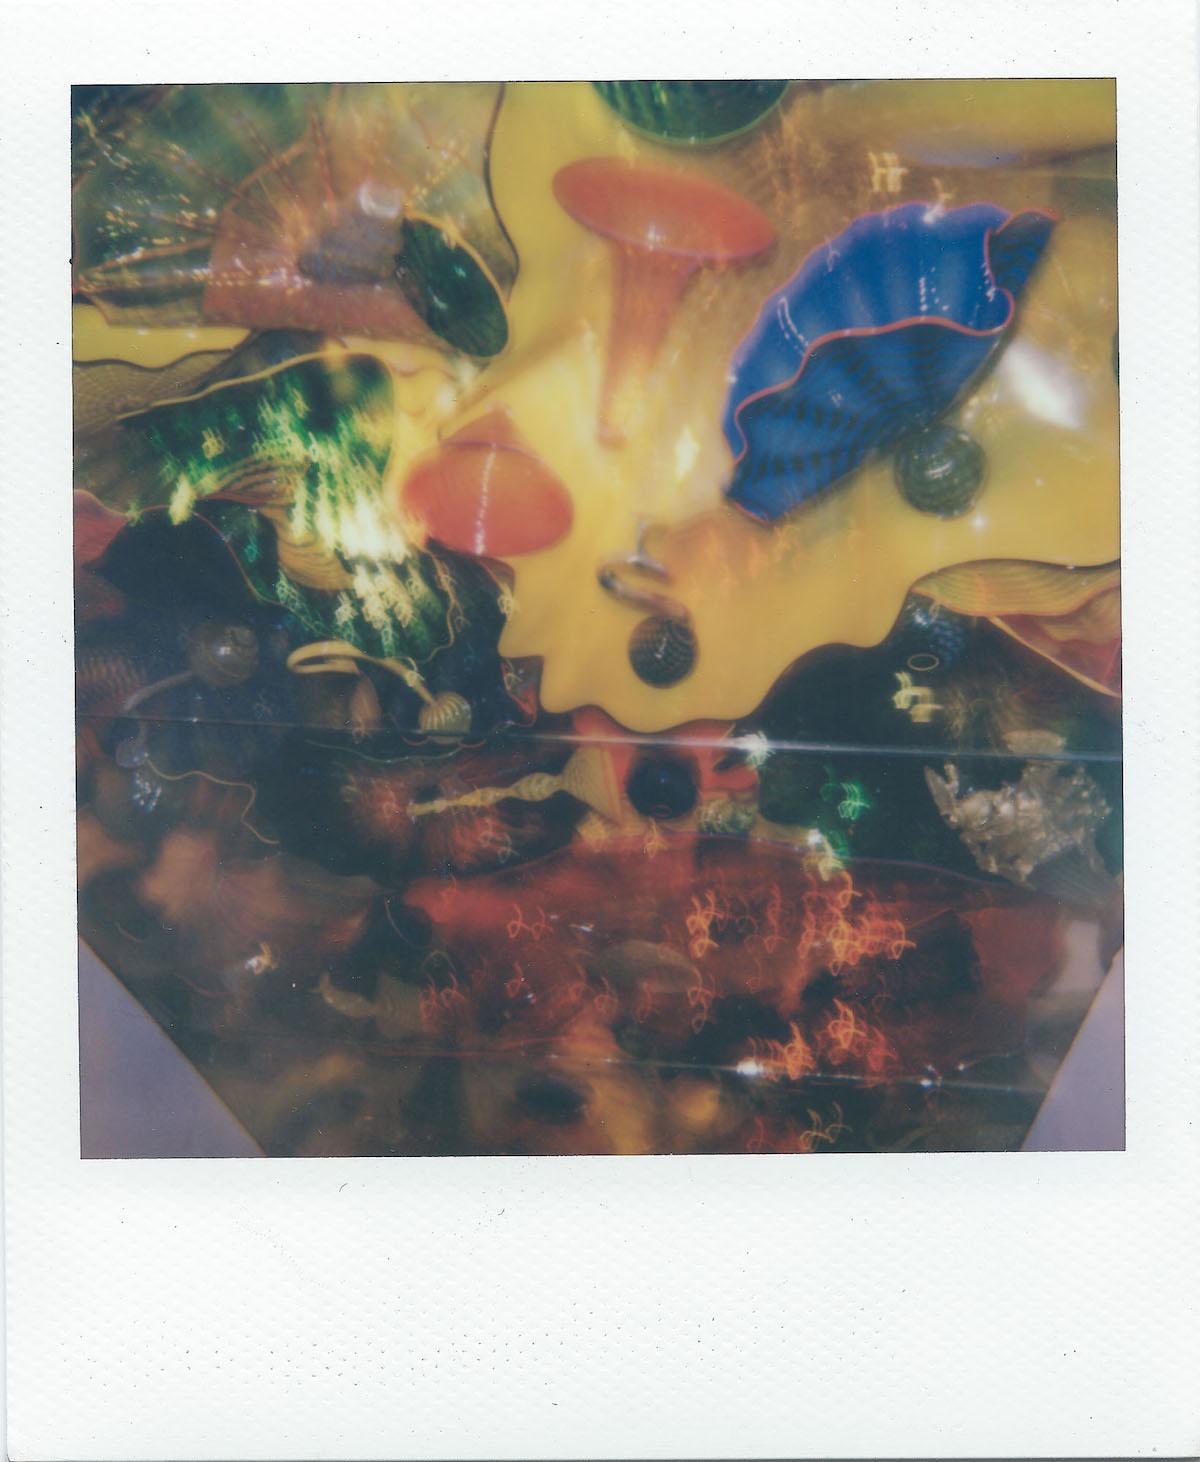 "Title Glass Reflector Medium Polaroid Size 3.5 x 4.2"""